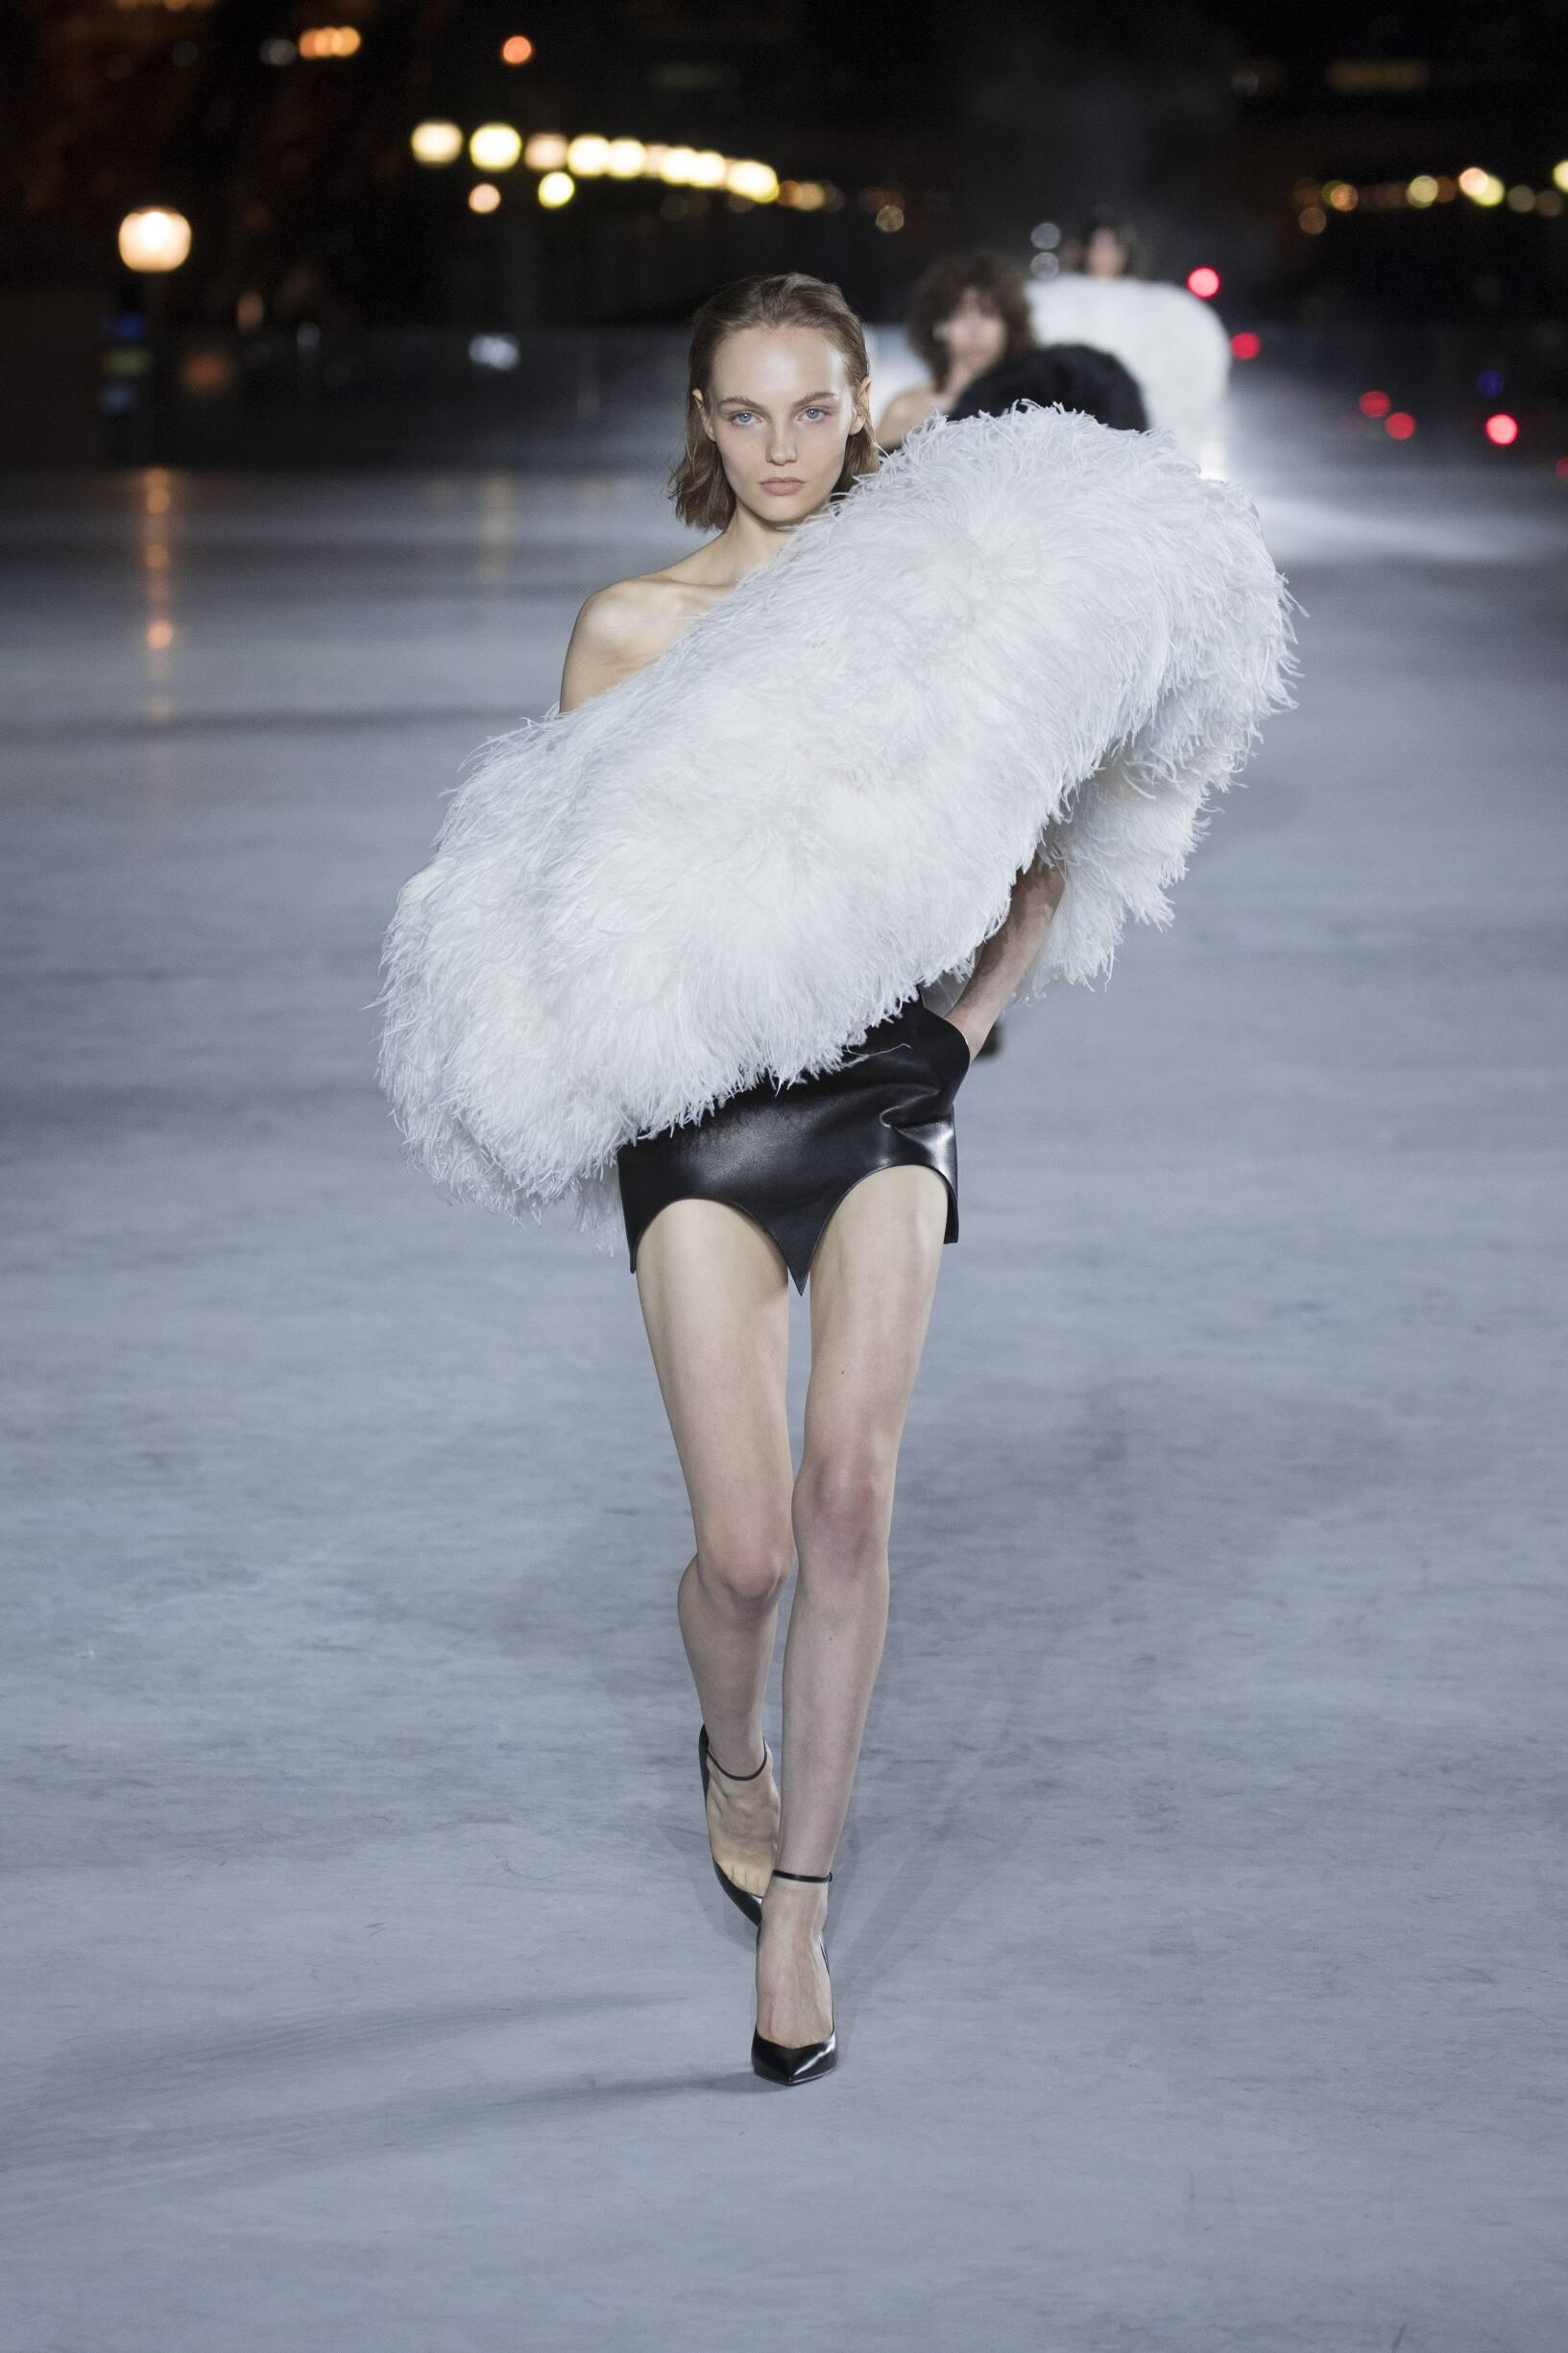 Saint Laurent Womenswear Collection Trends Summer